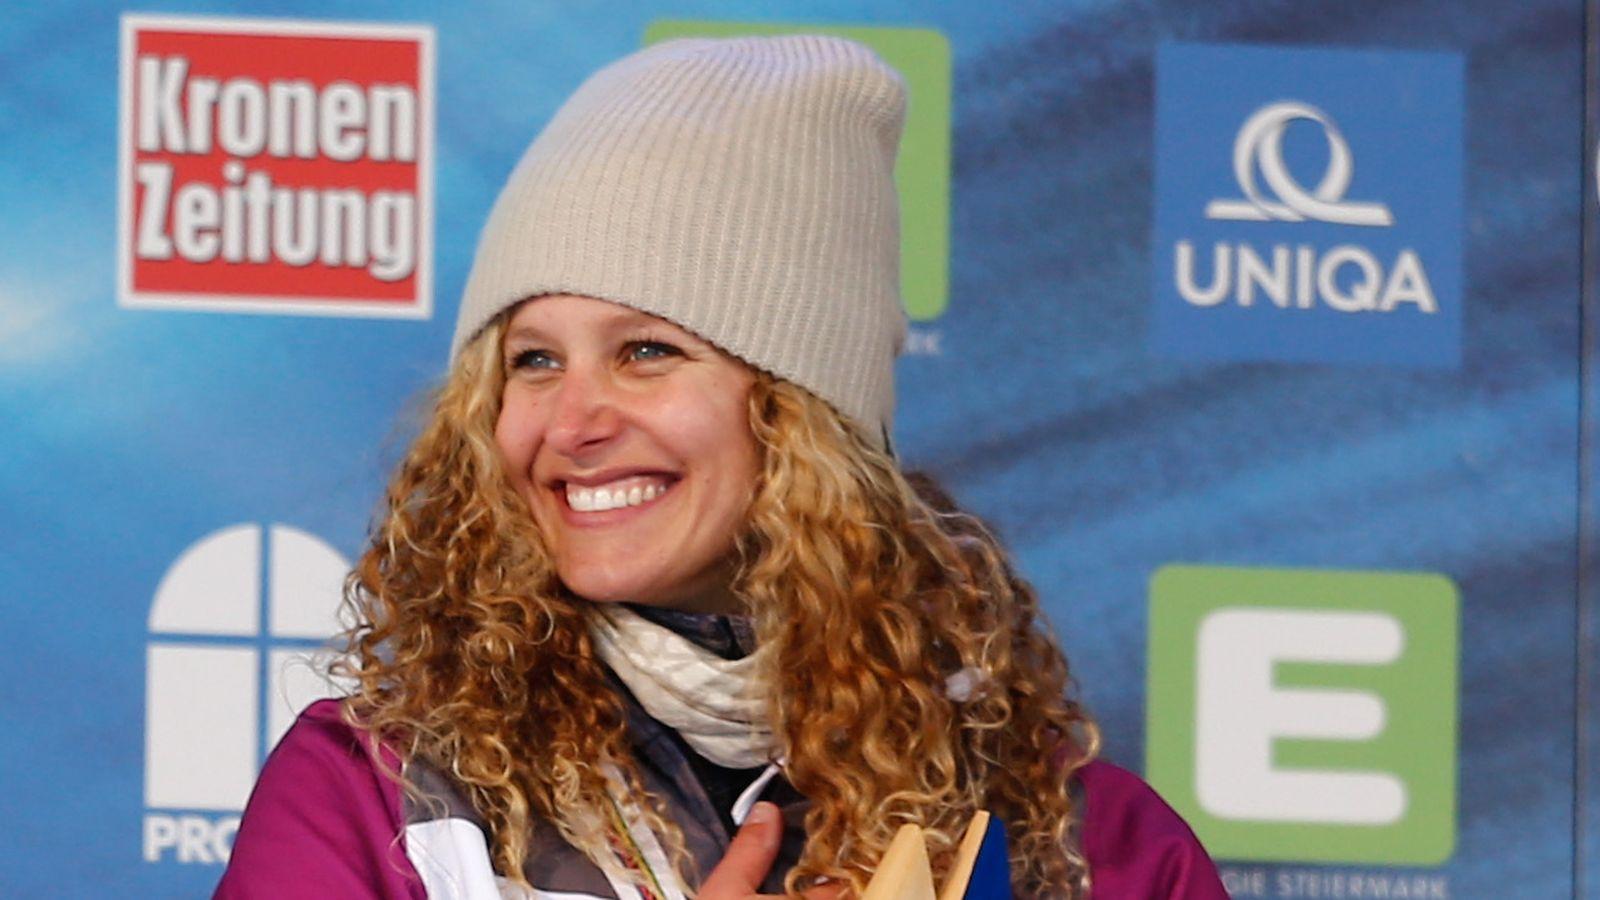 Winter X Games results 2016: Lindsey Jacobellis wins 10th snowboarding gold medal – SBNation.com